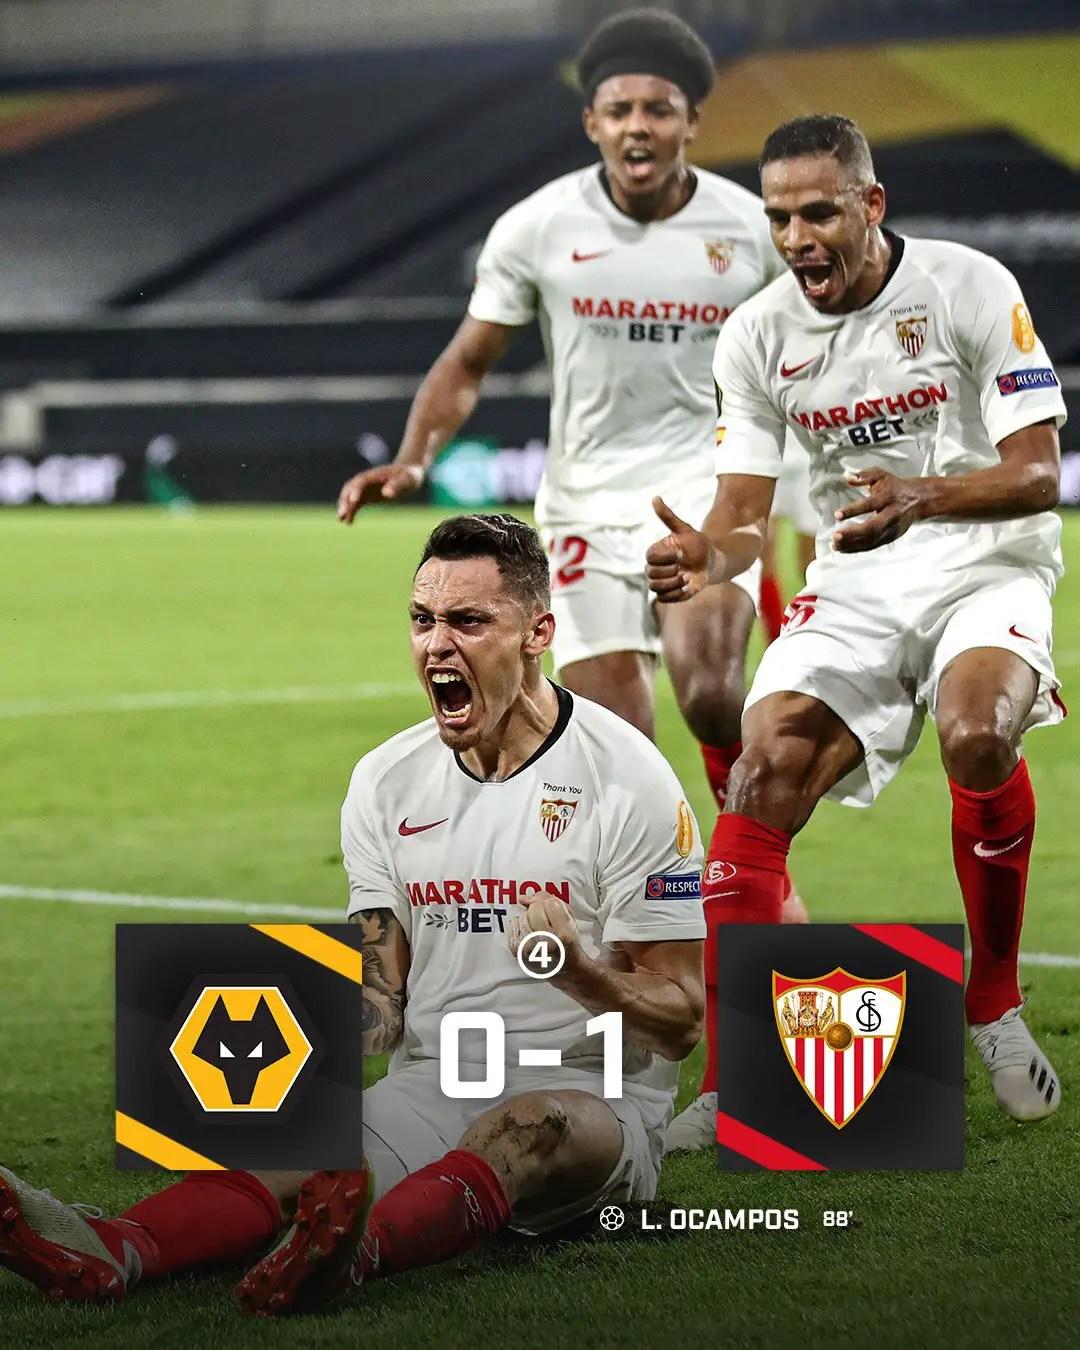 Europa League: Sevilla, Shakhtar Beat Wolves, Basel, Qualify For Semi-finals